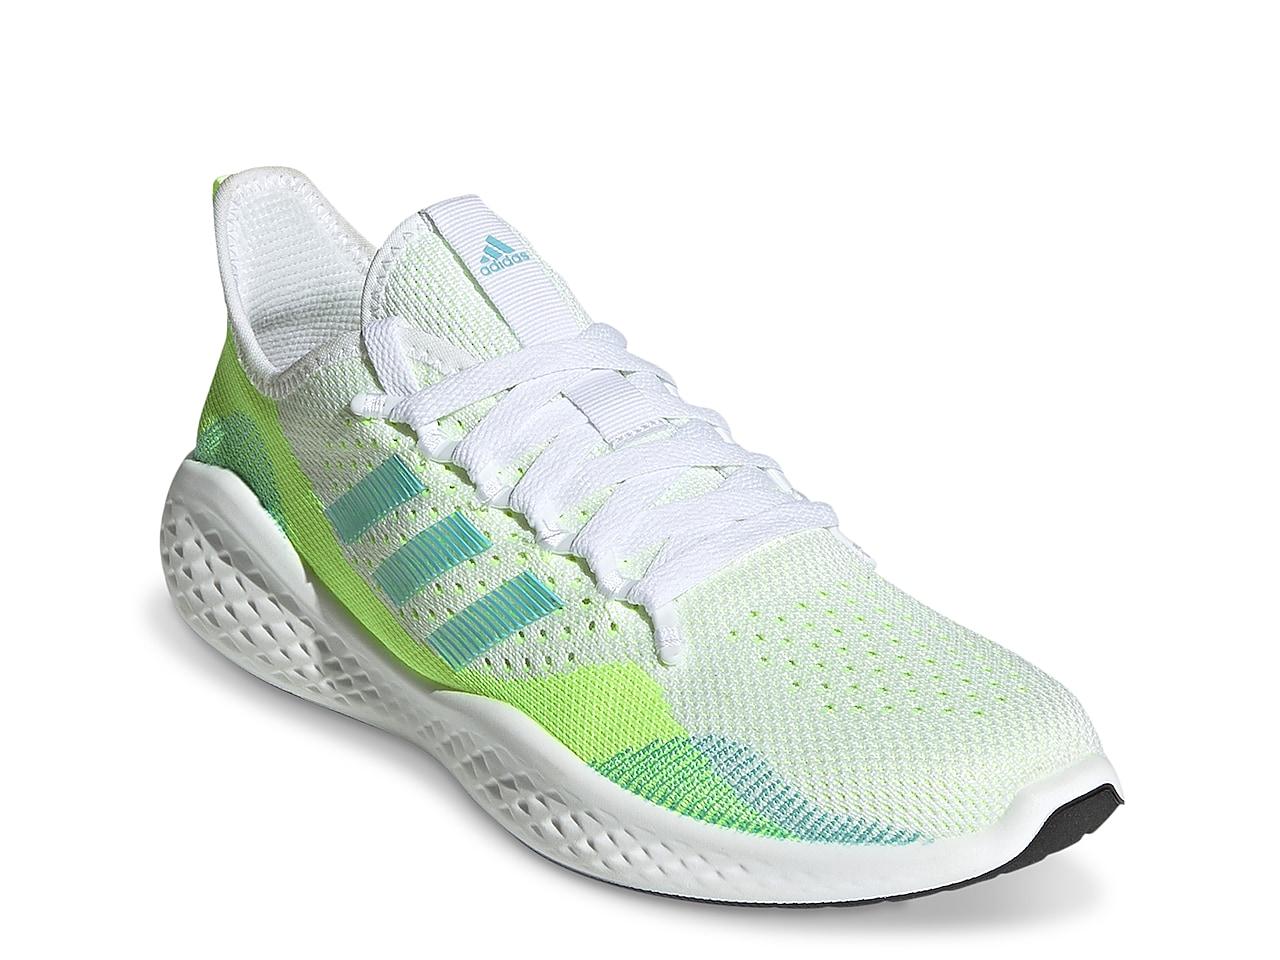 adidas FluidFlow 2.0 Running Shoe - Women's